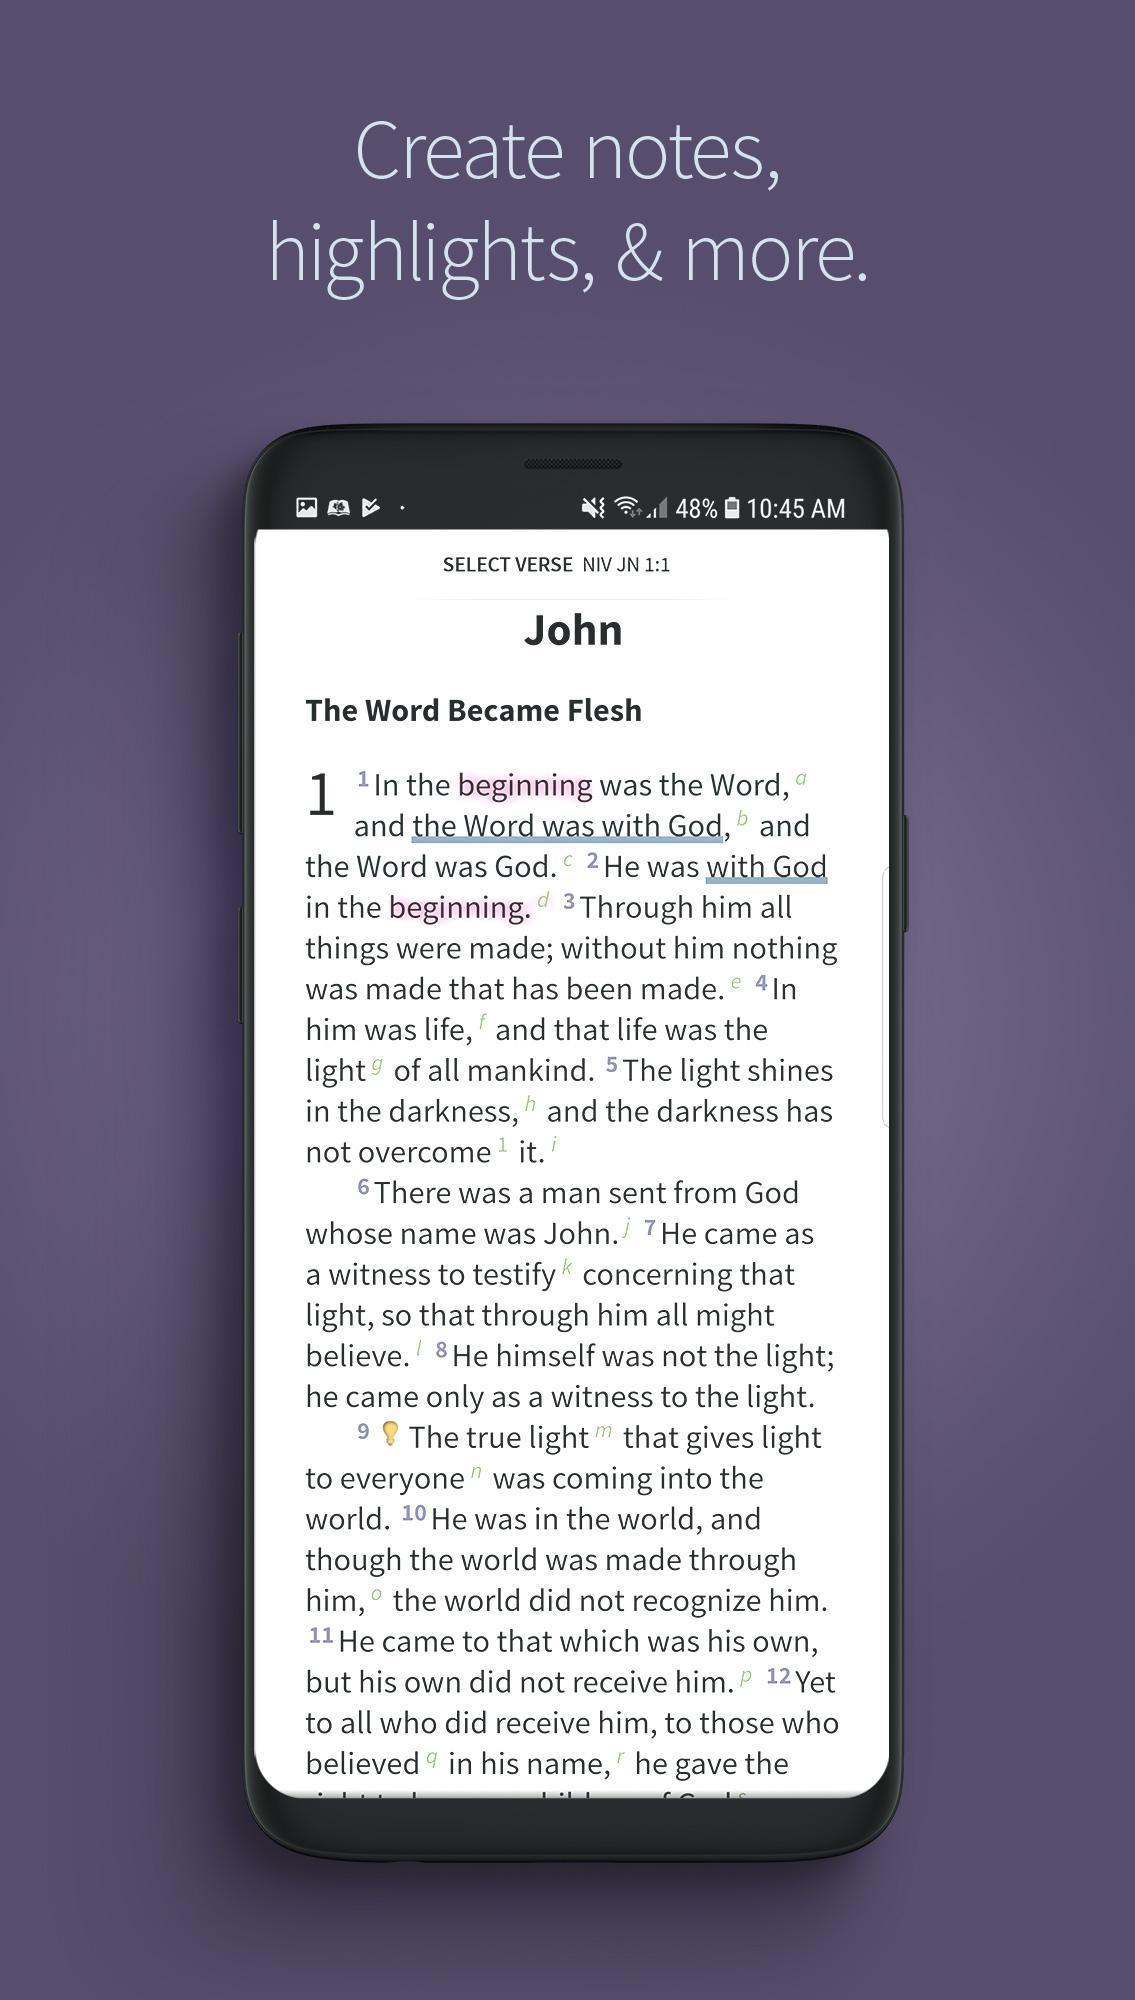 Bible App by Olive Tree 7.5.4.0.5664 Screenshot 5